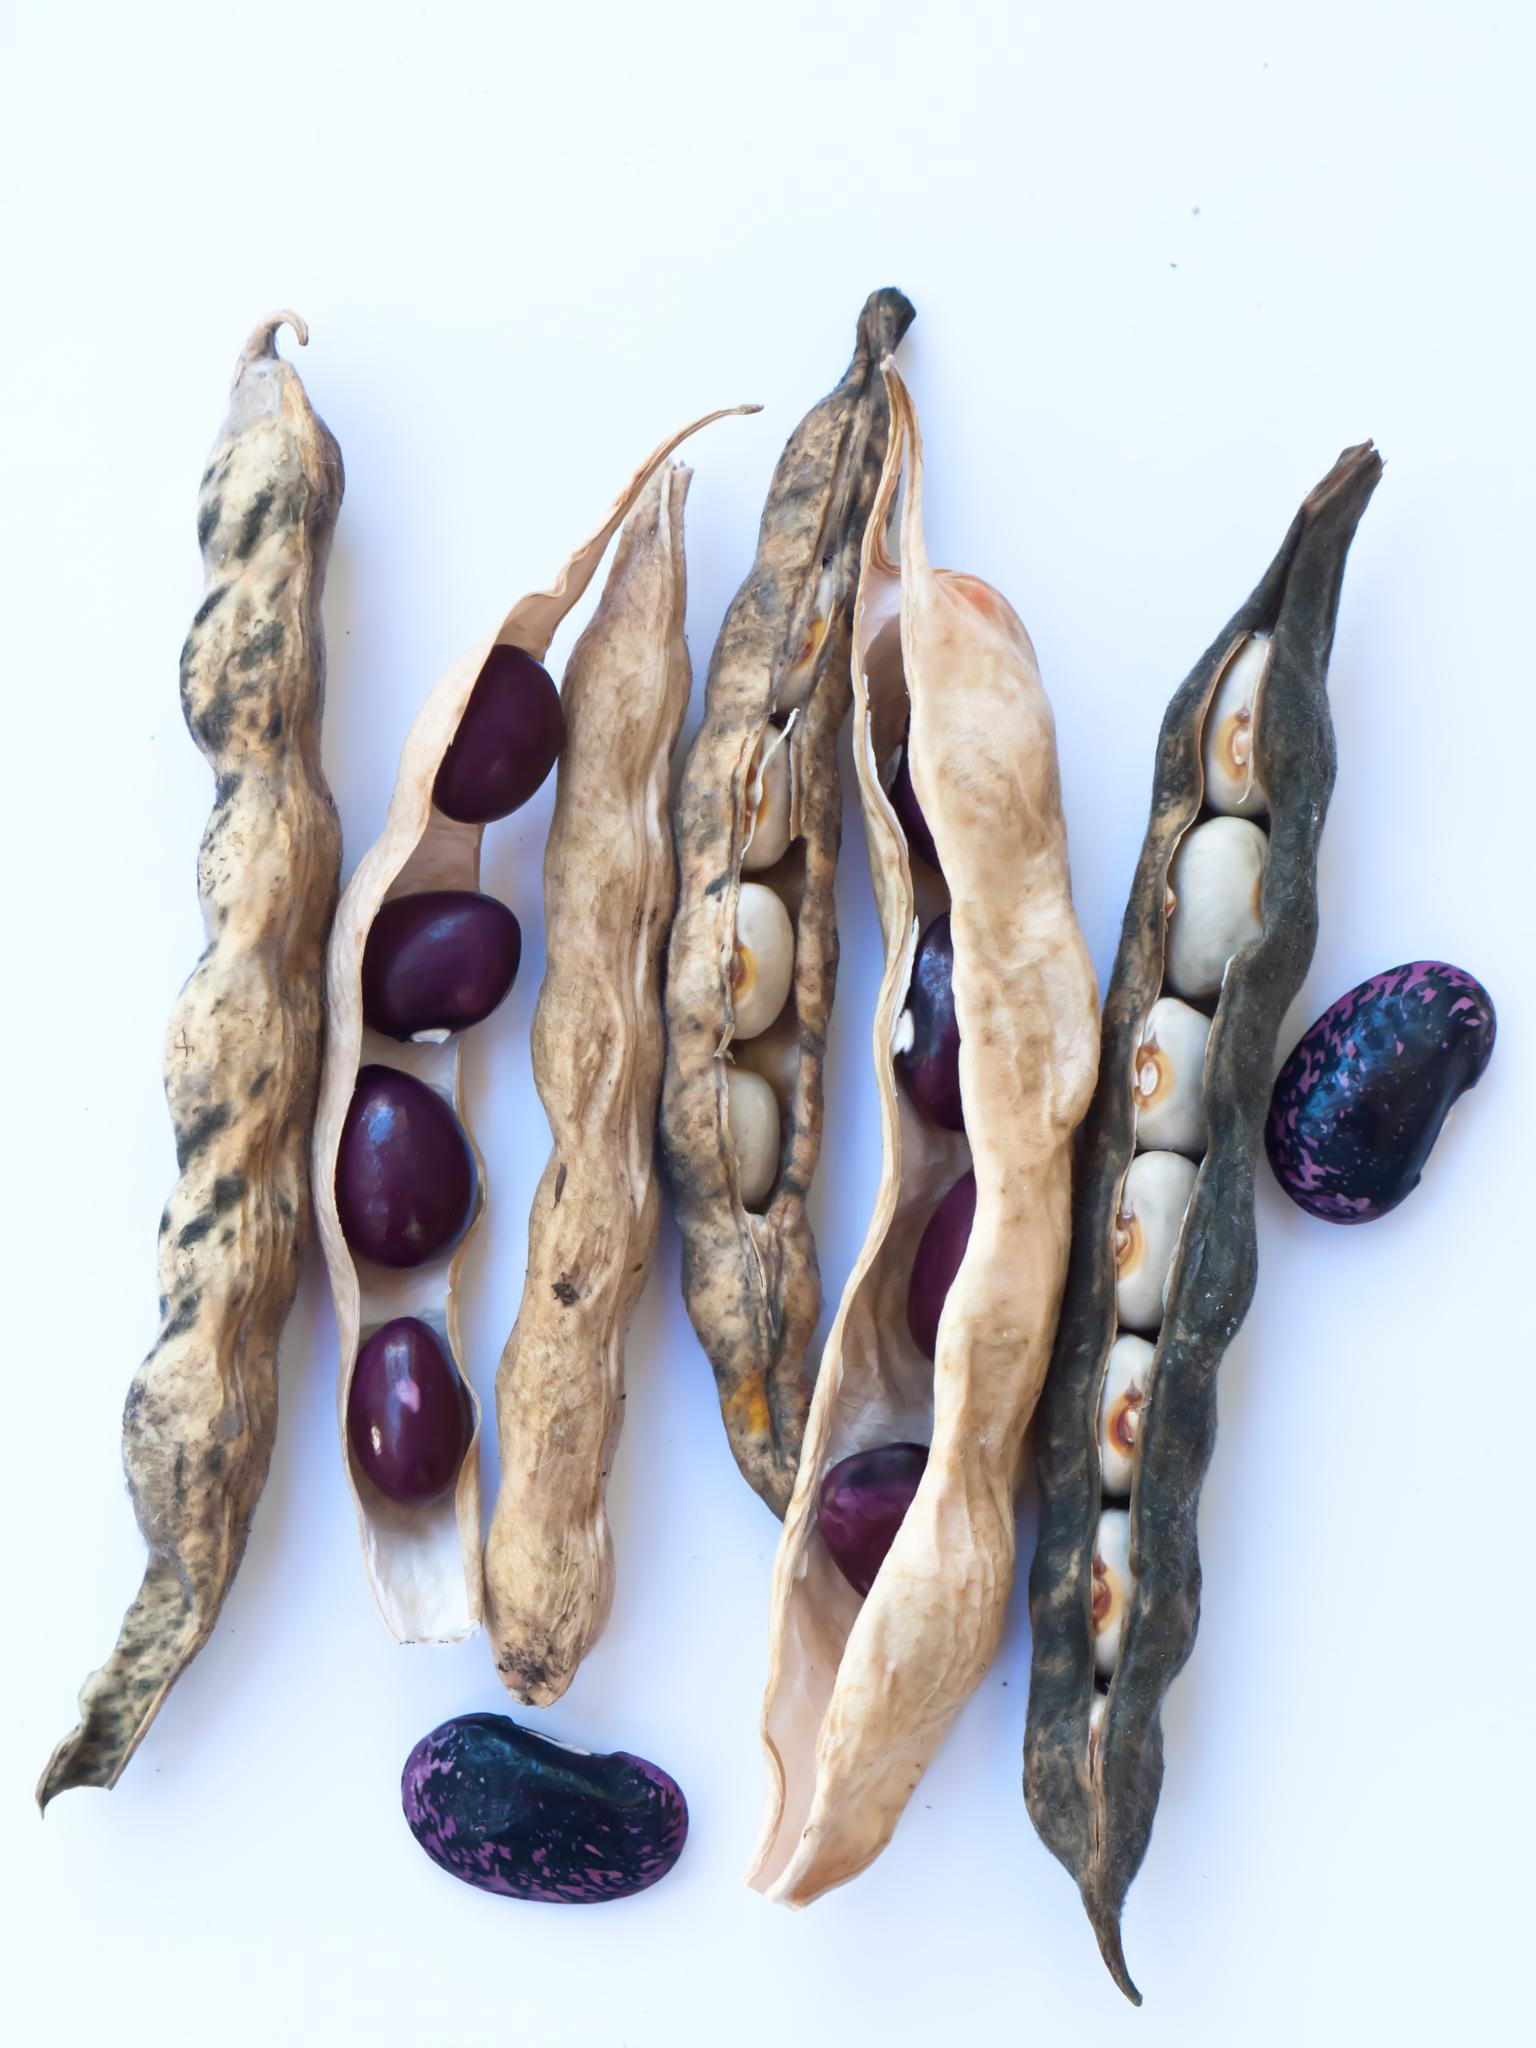 Various shell beans by Leann